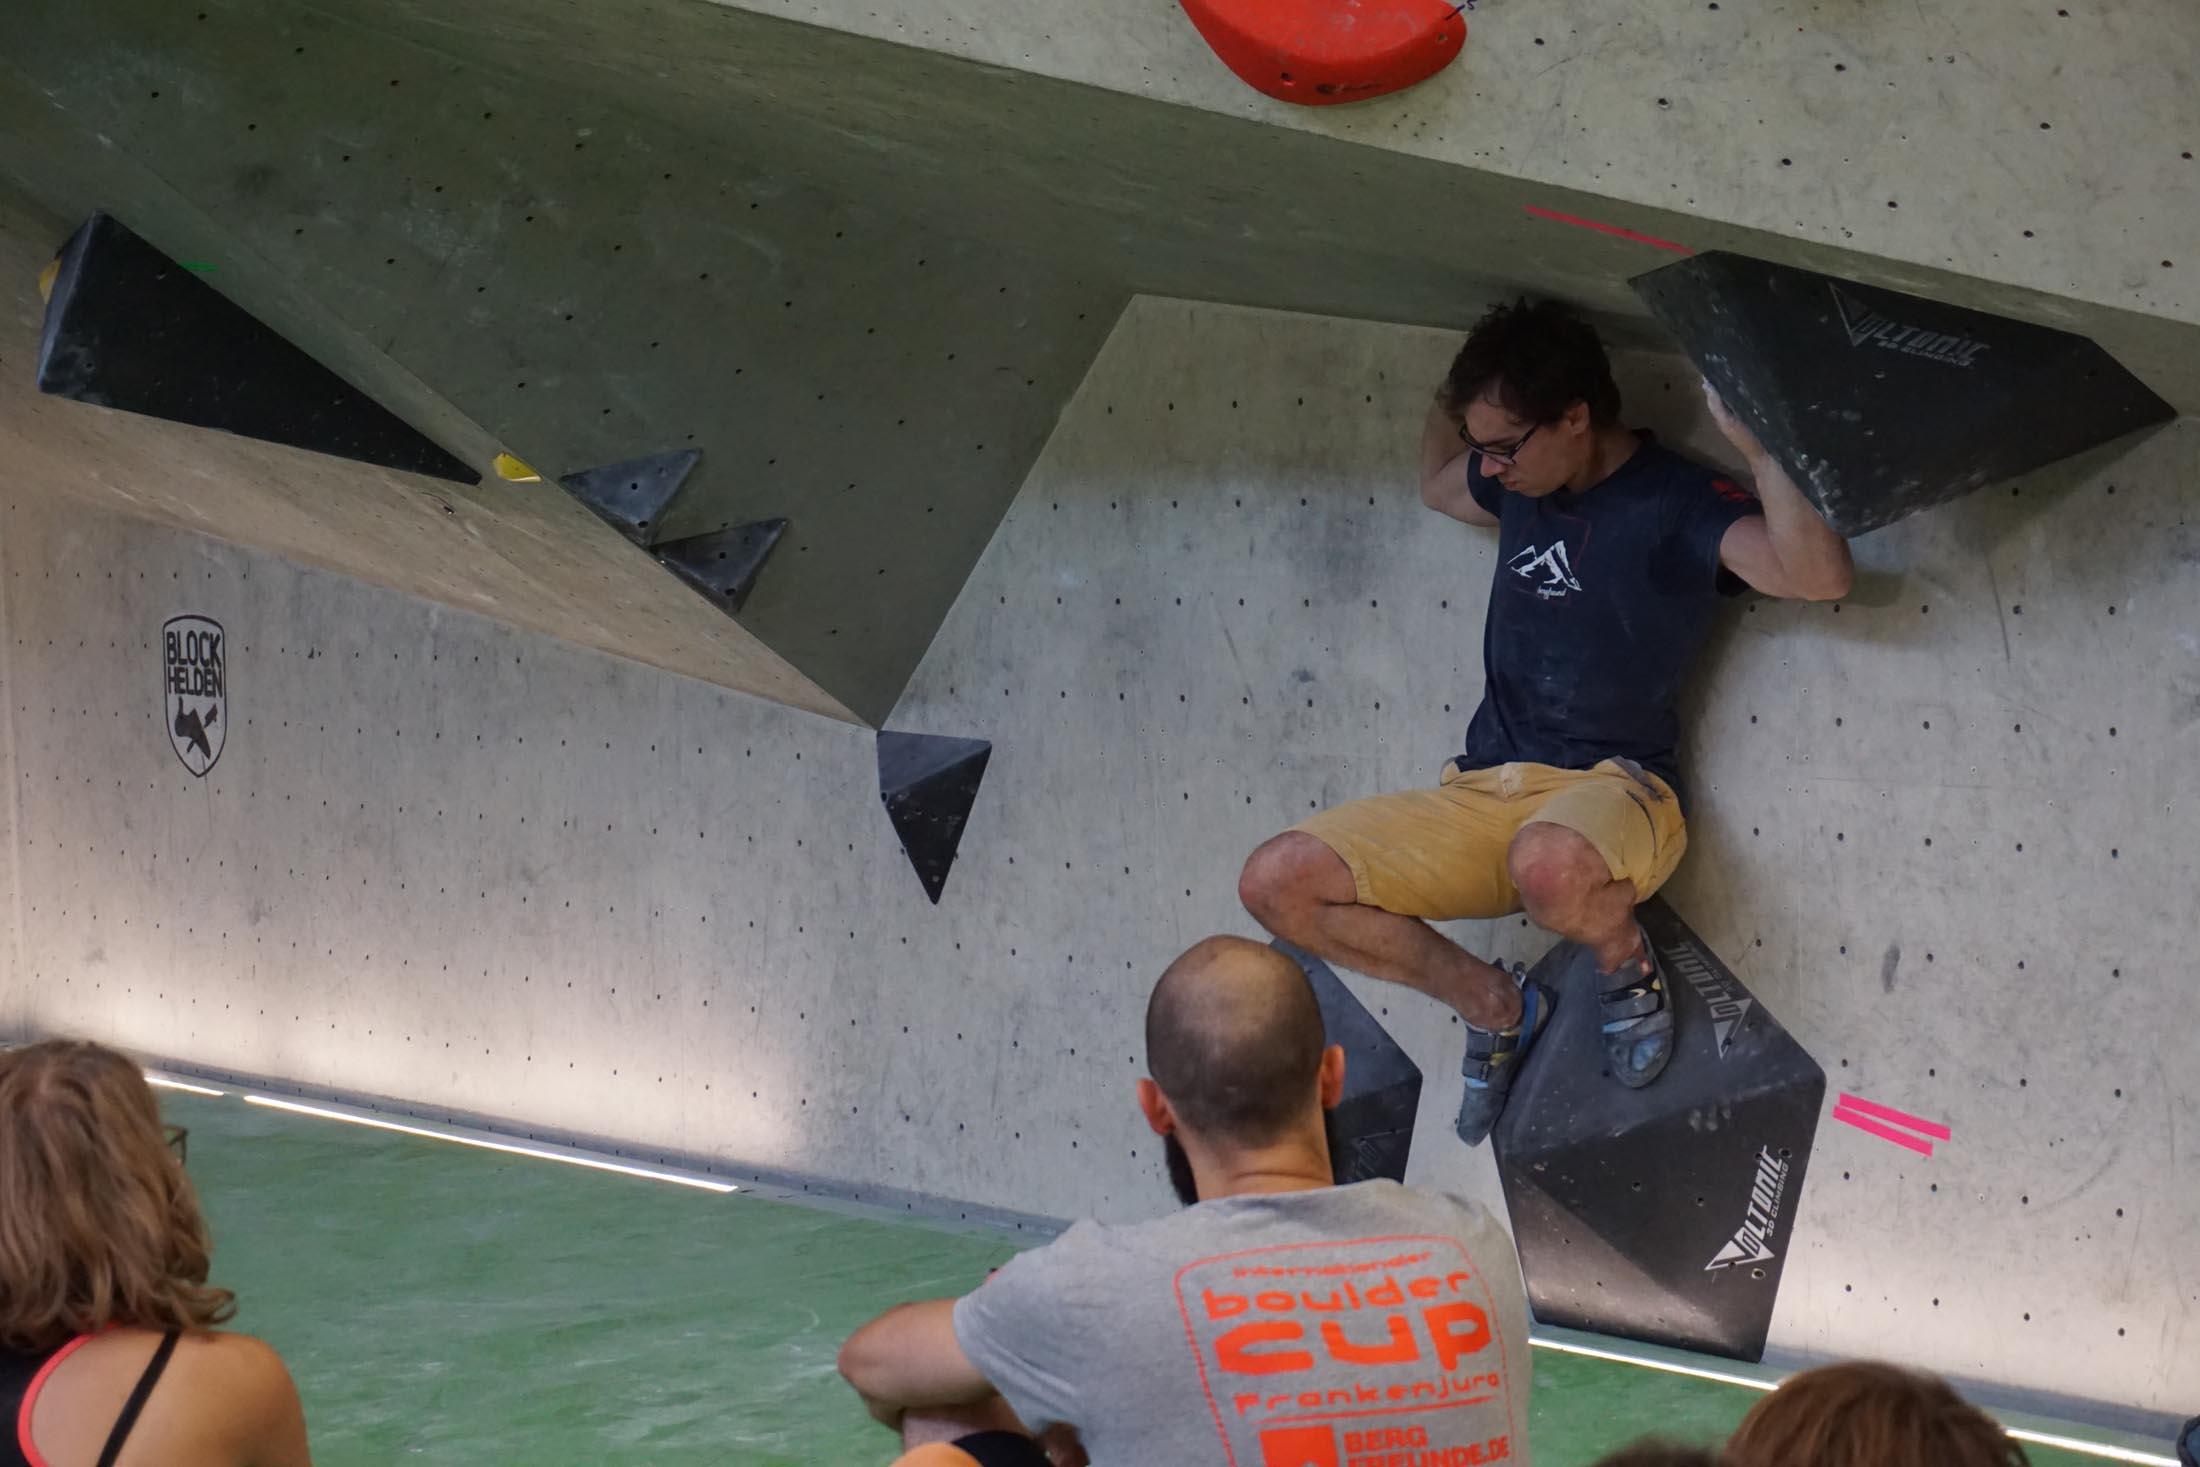 Finale, internationaler bouldercup Frankenjura 2016, BLOCKHELDEN Erlangen, Mammut, Bergfreunde.de, Boulderwettkampf07092016712